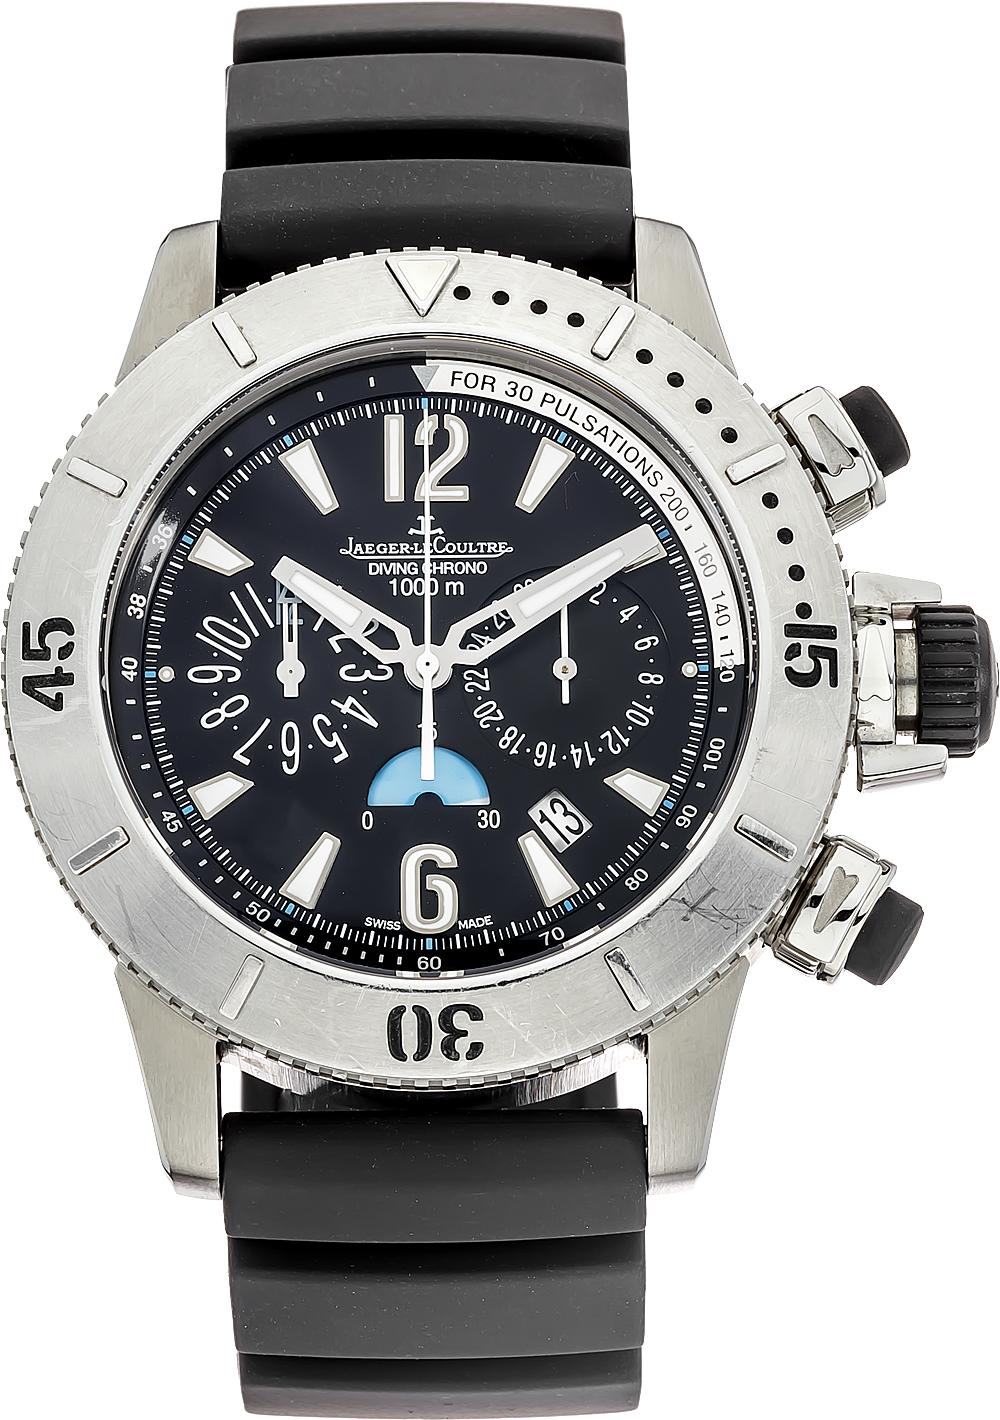 Jaeger-LeCoultre Master Compressor Diving Chronograph 186T670